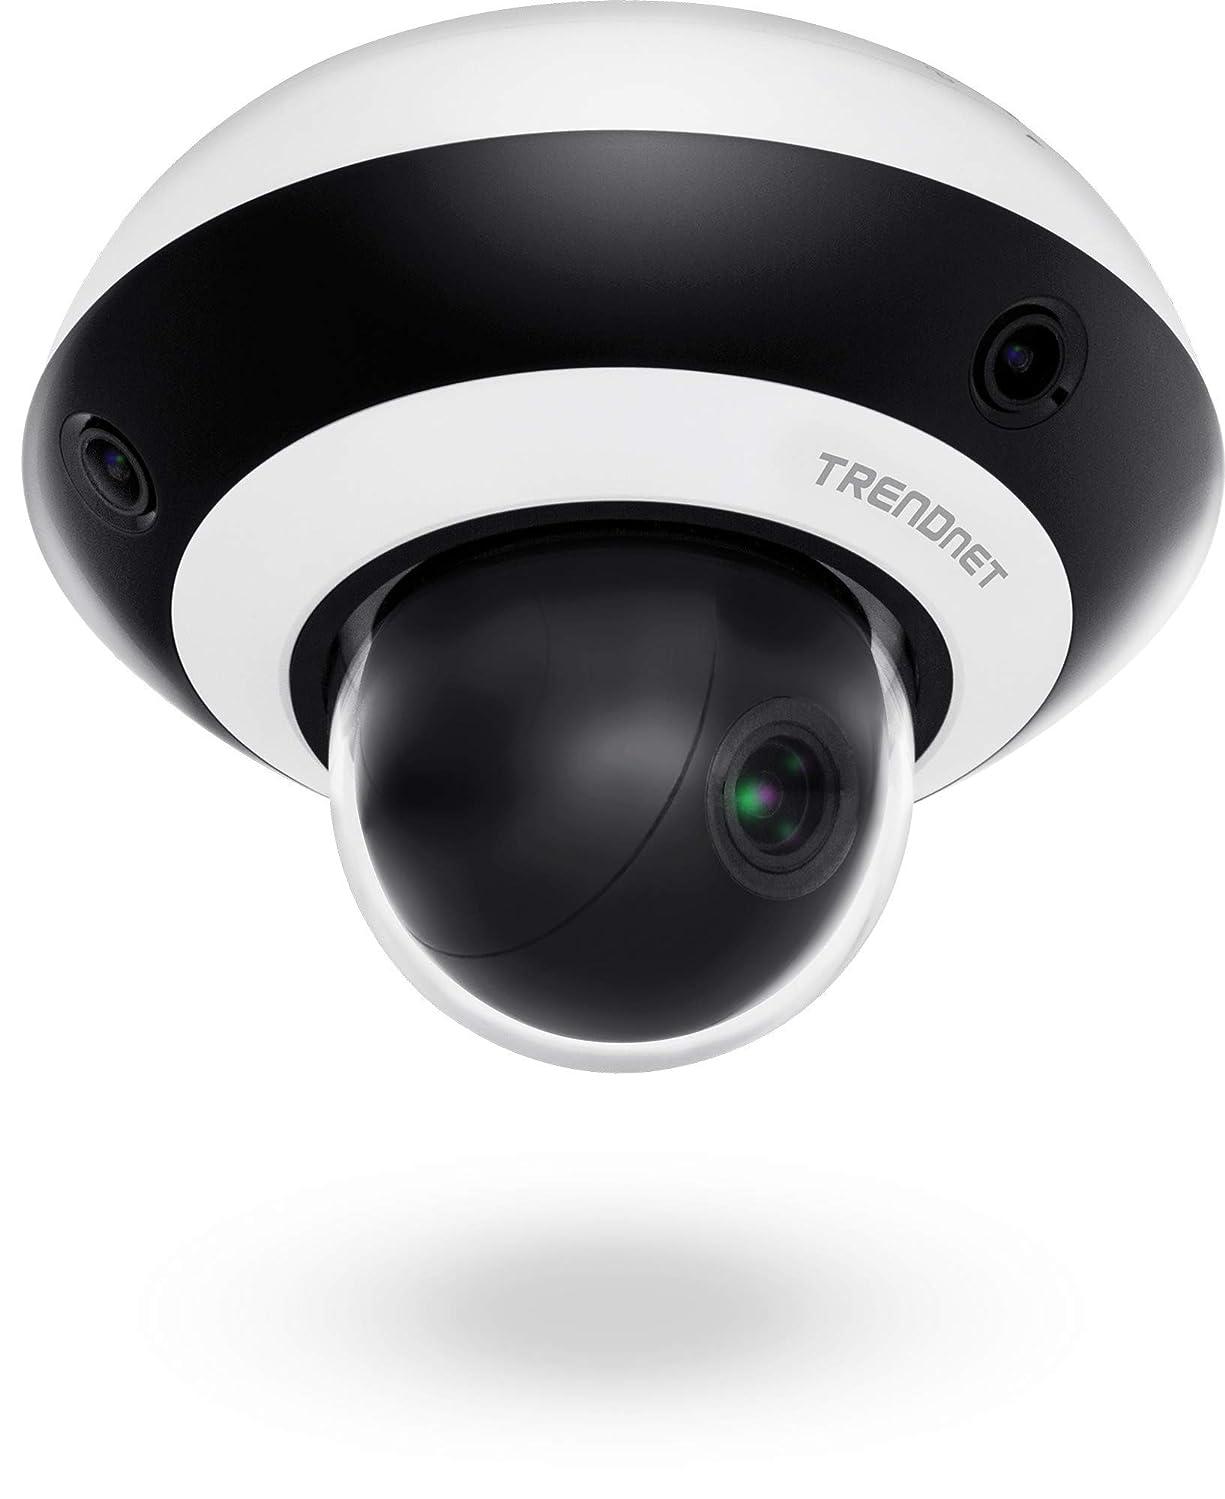 TRENDnet Multi-Sensor H.265 1080P PoE+ PTZ Camera, 1X 2MP Ptz Camera (2.8-12mm Optical Zoom), 3X 2MP Fixed Cameras (2mm), 360° Video Coverage, IR Night Vision Up to 10M (33 ft.), TV-IP460PI